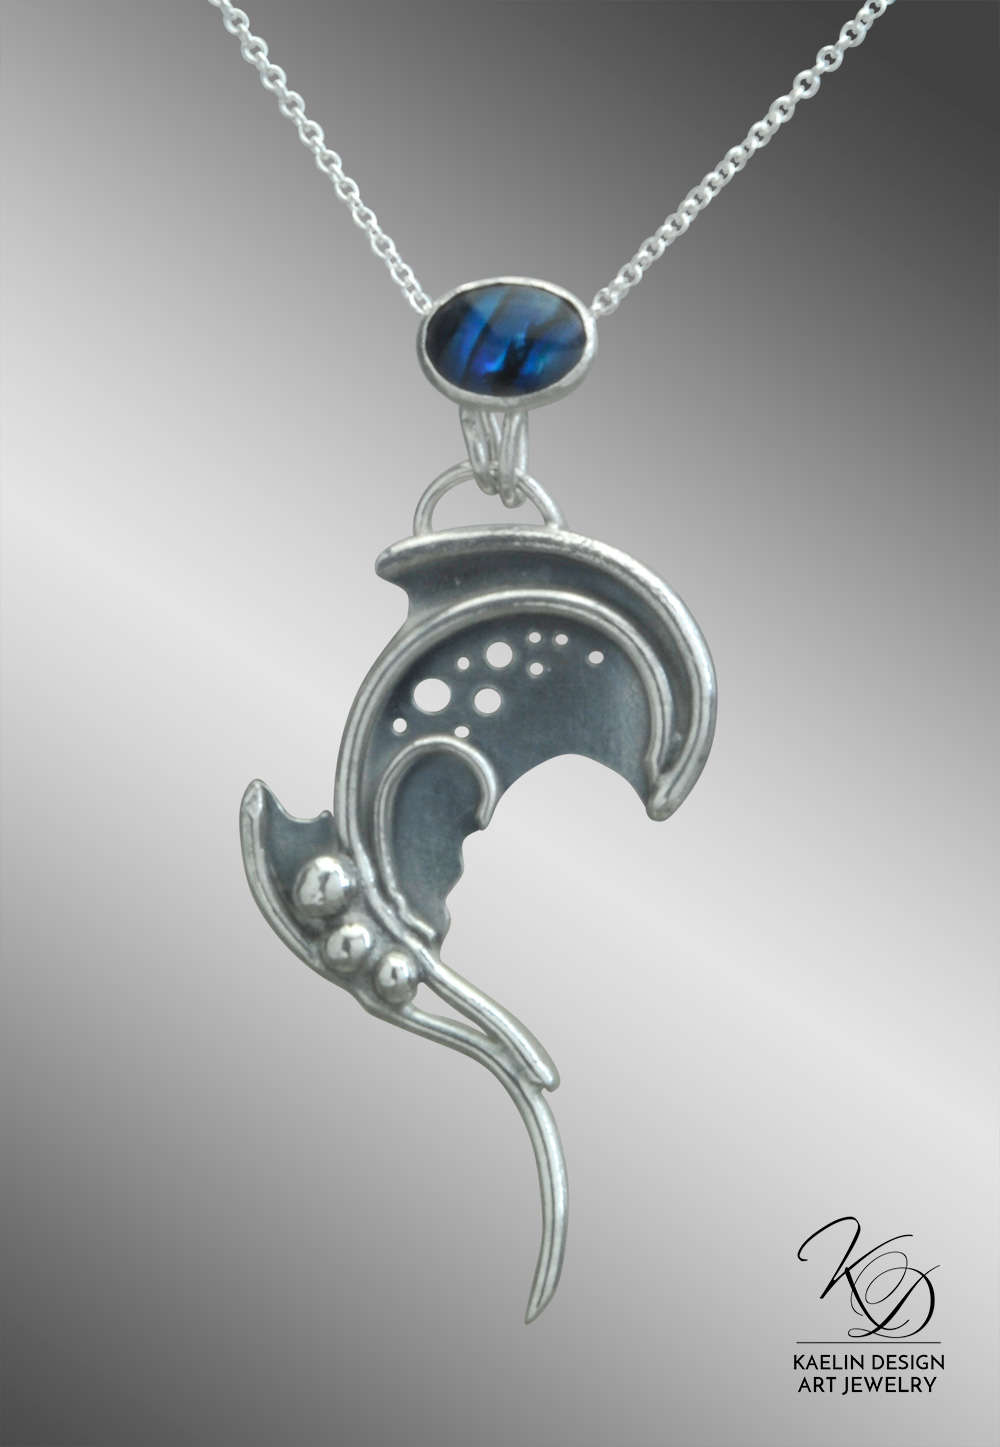 Briny Depths Sterling Silver Paua Art Jewelry Pendant by Kaelin Design